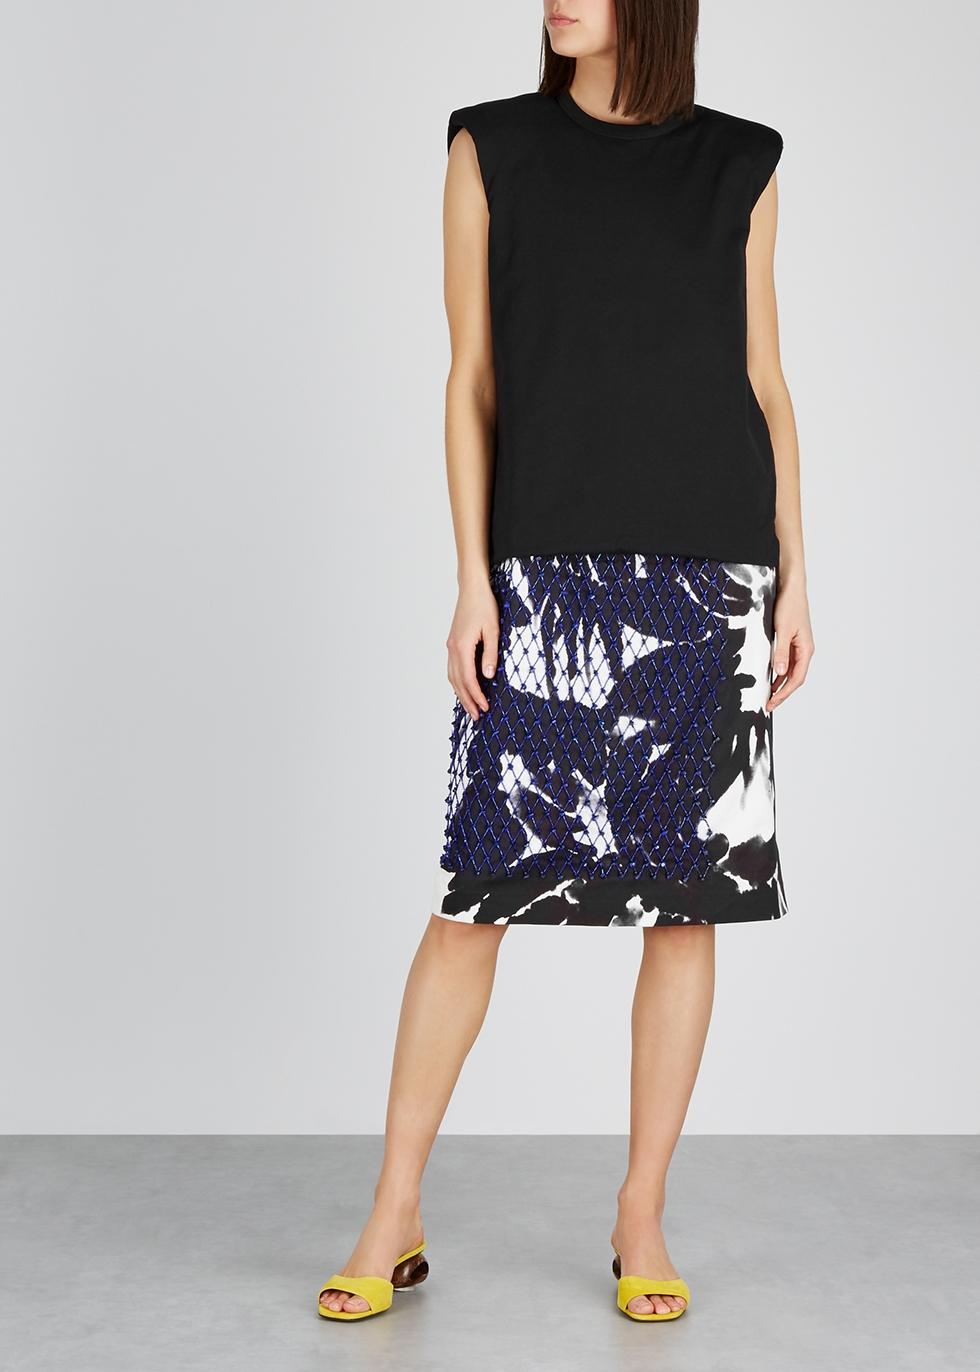 Dixi embellished cotton midi dress - Dries Van Noten